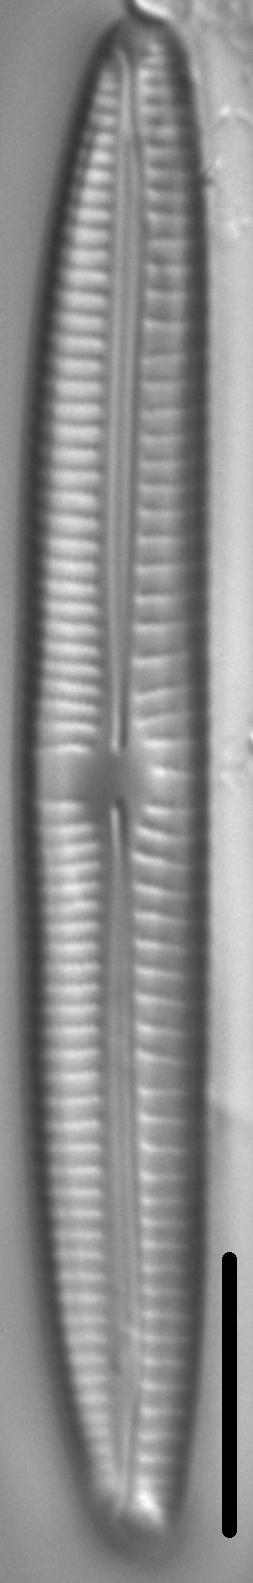 Encyonema sibericum LM1